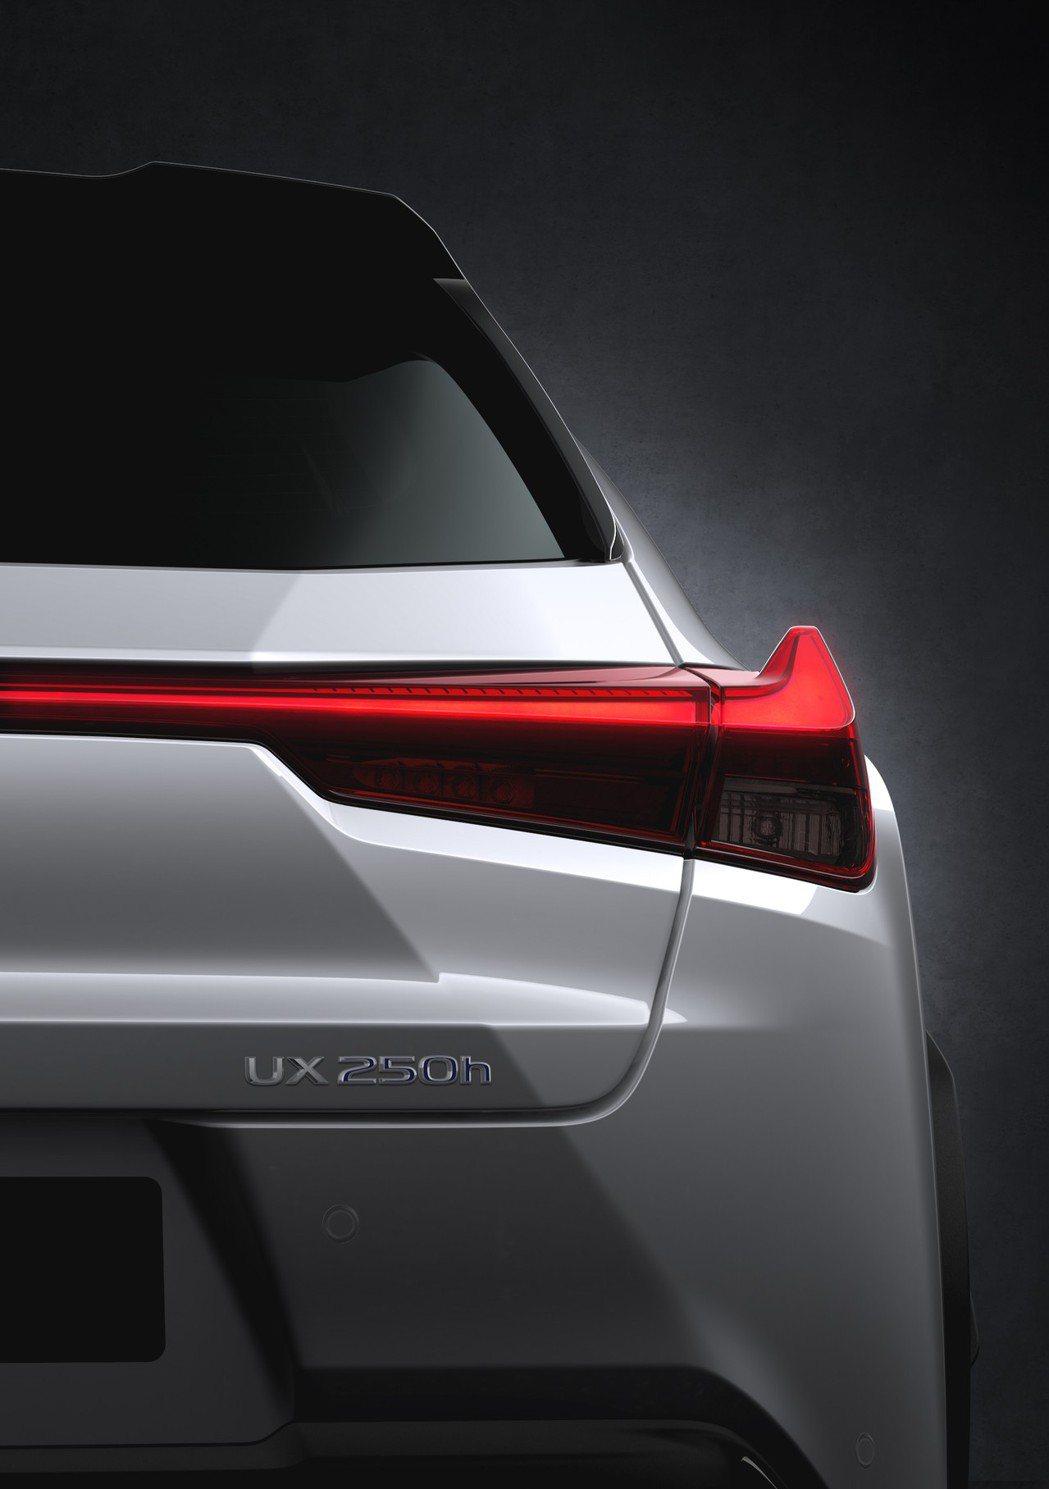 UX尾燈承襲了Concept版的設計。 摘自Lexus